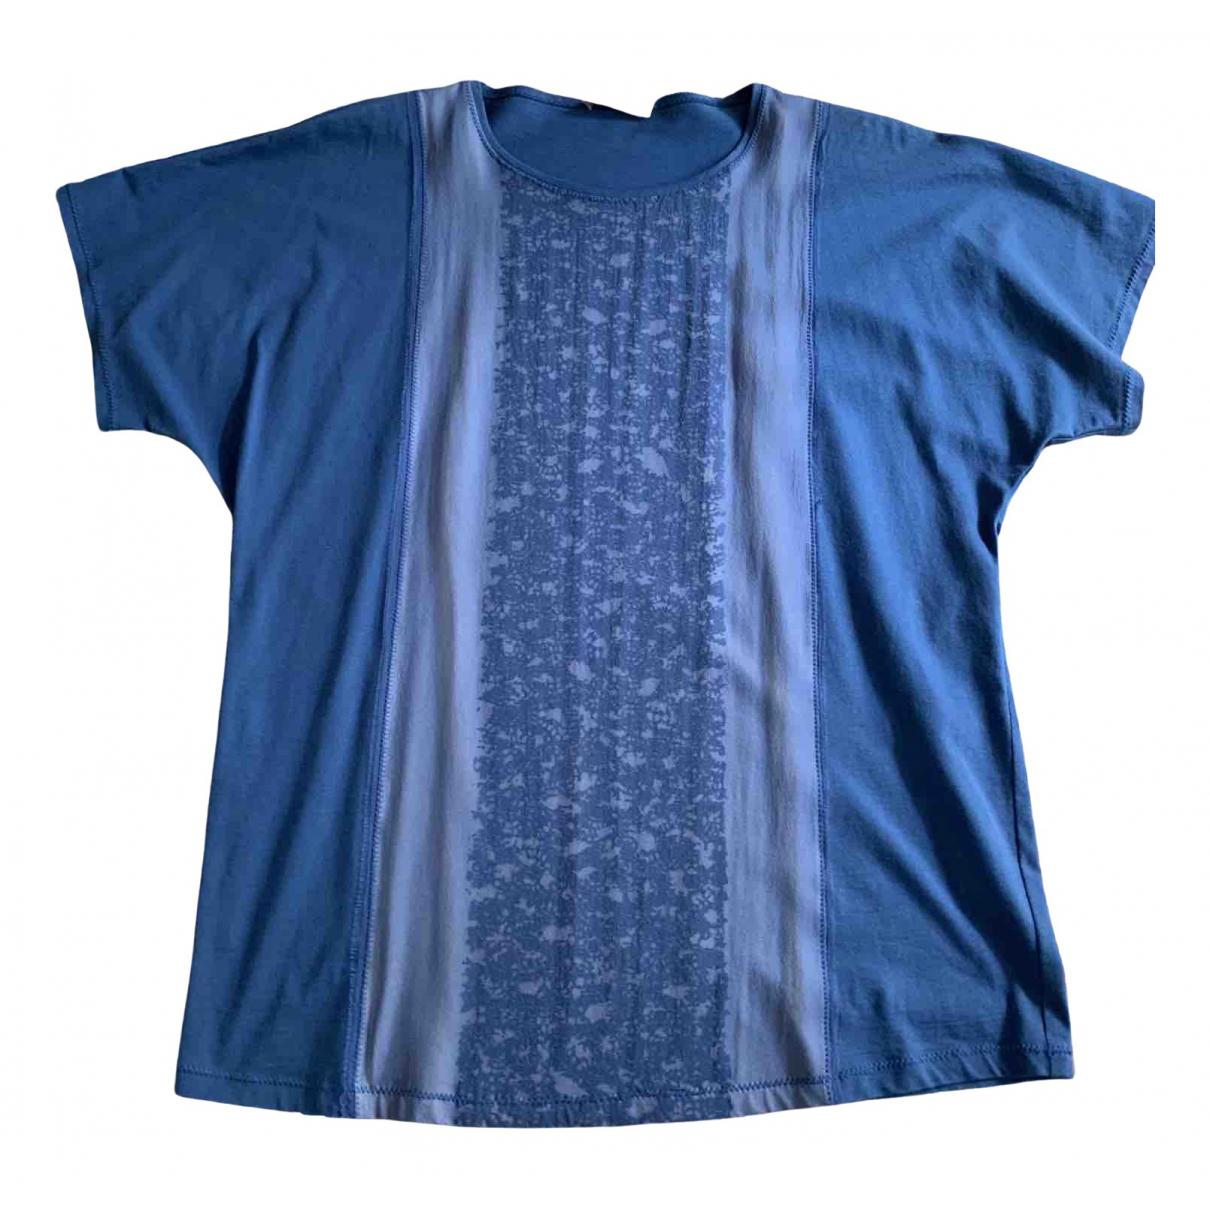 Bottega Veneta N Blue Cotton  top for Women 40 IT